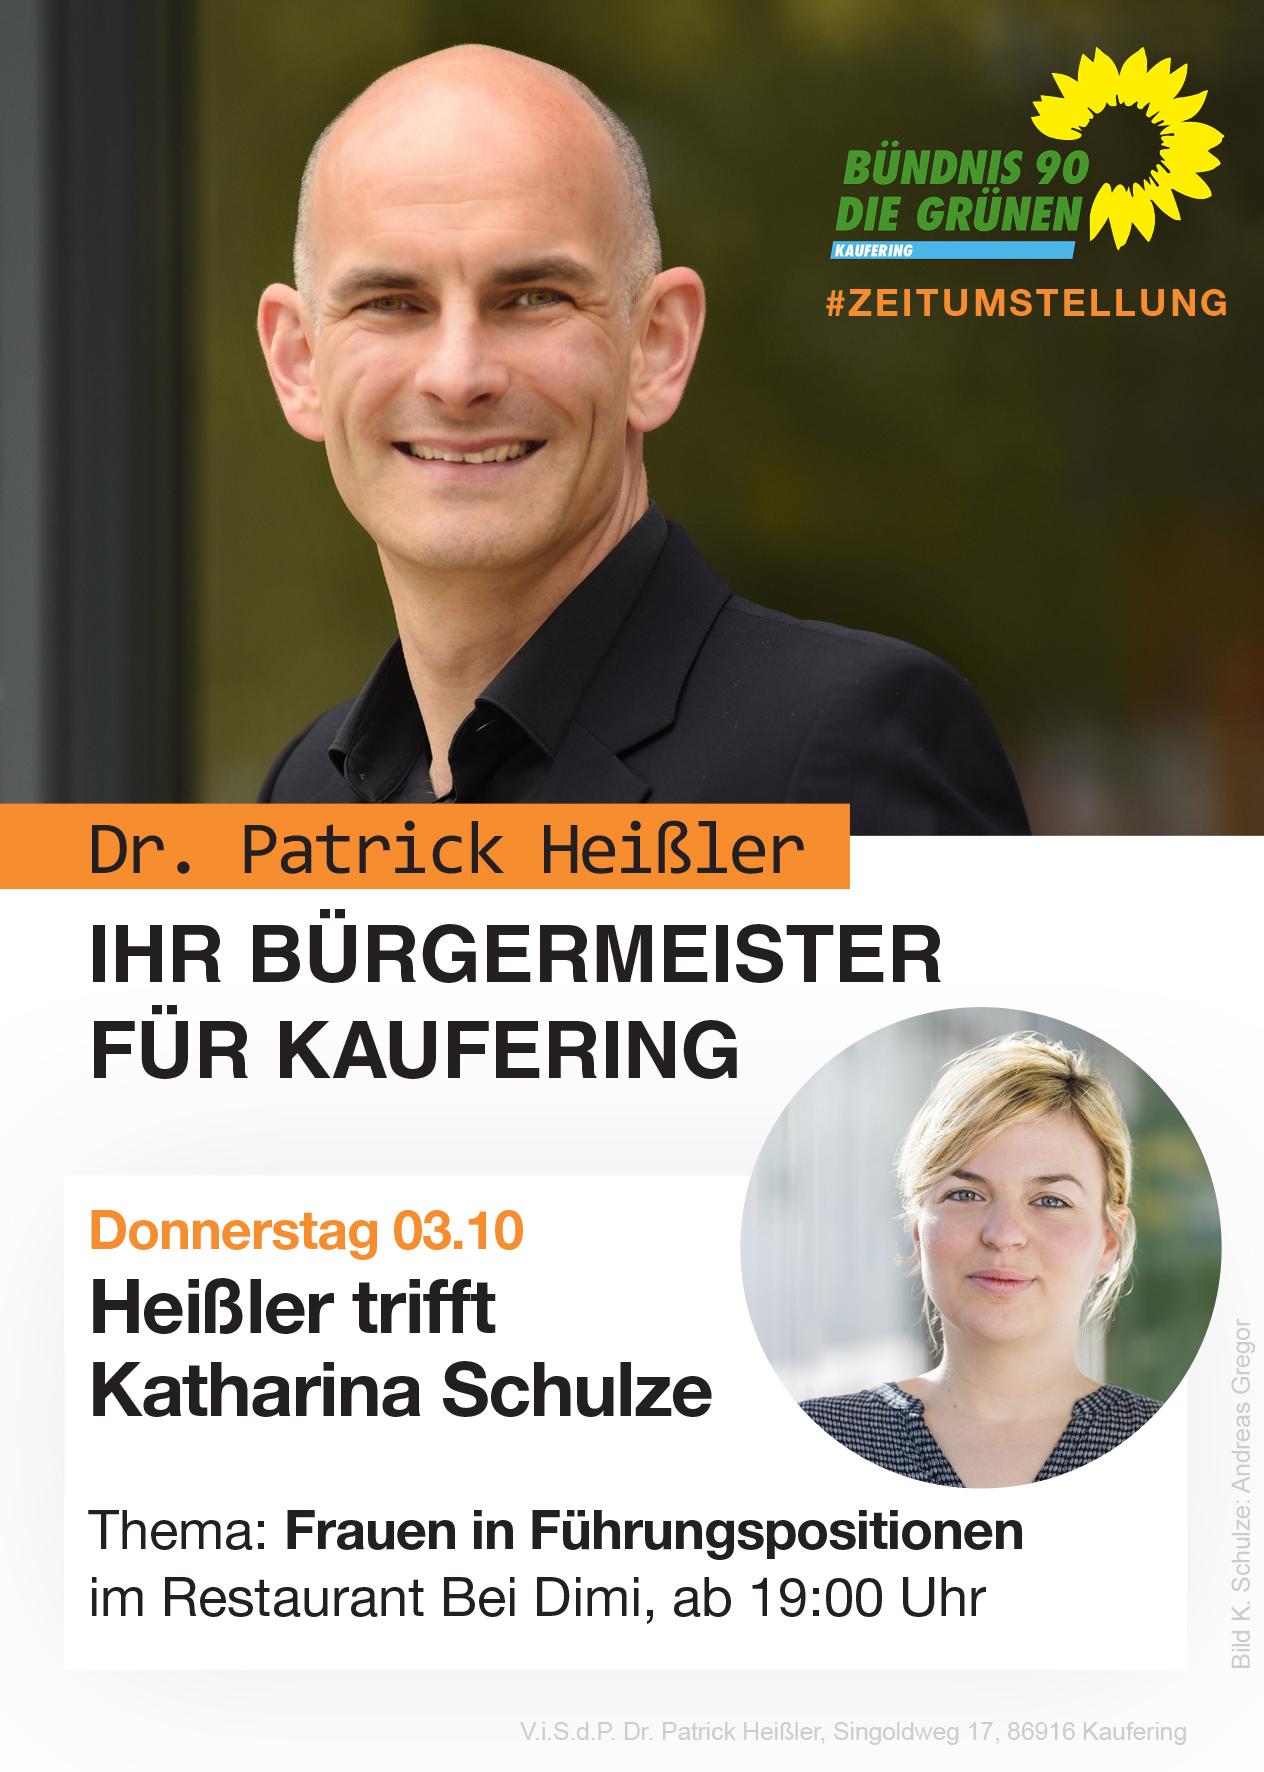 03.10.2019: Patrick Heißler trifft Katharina Schulze